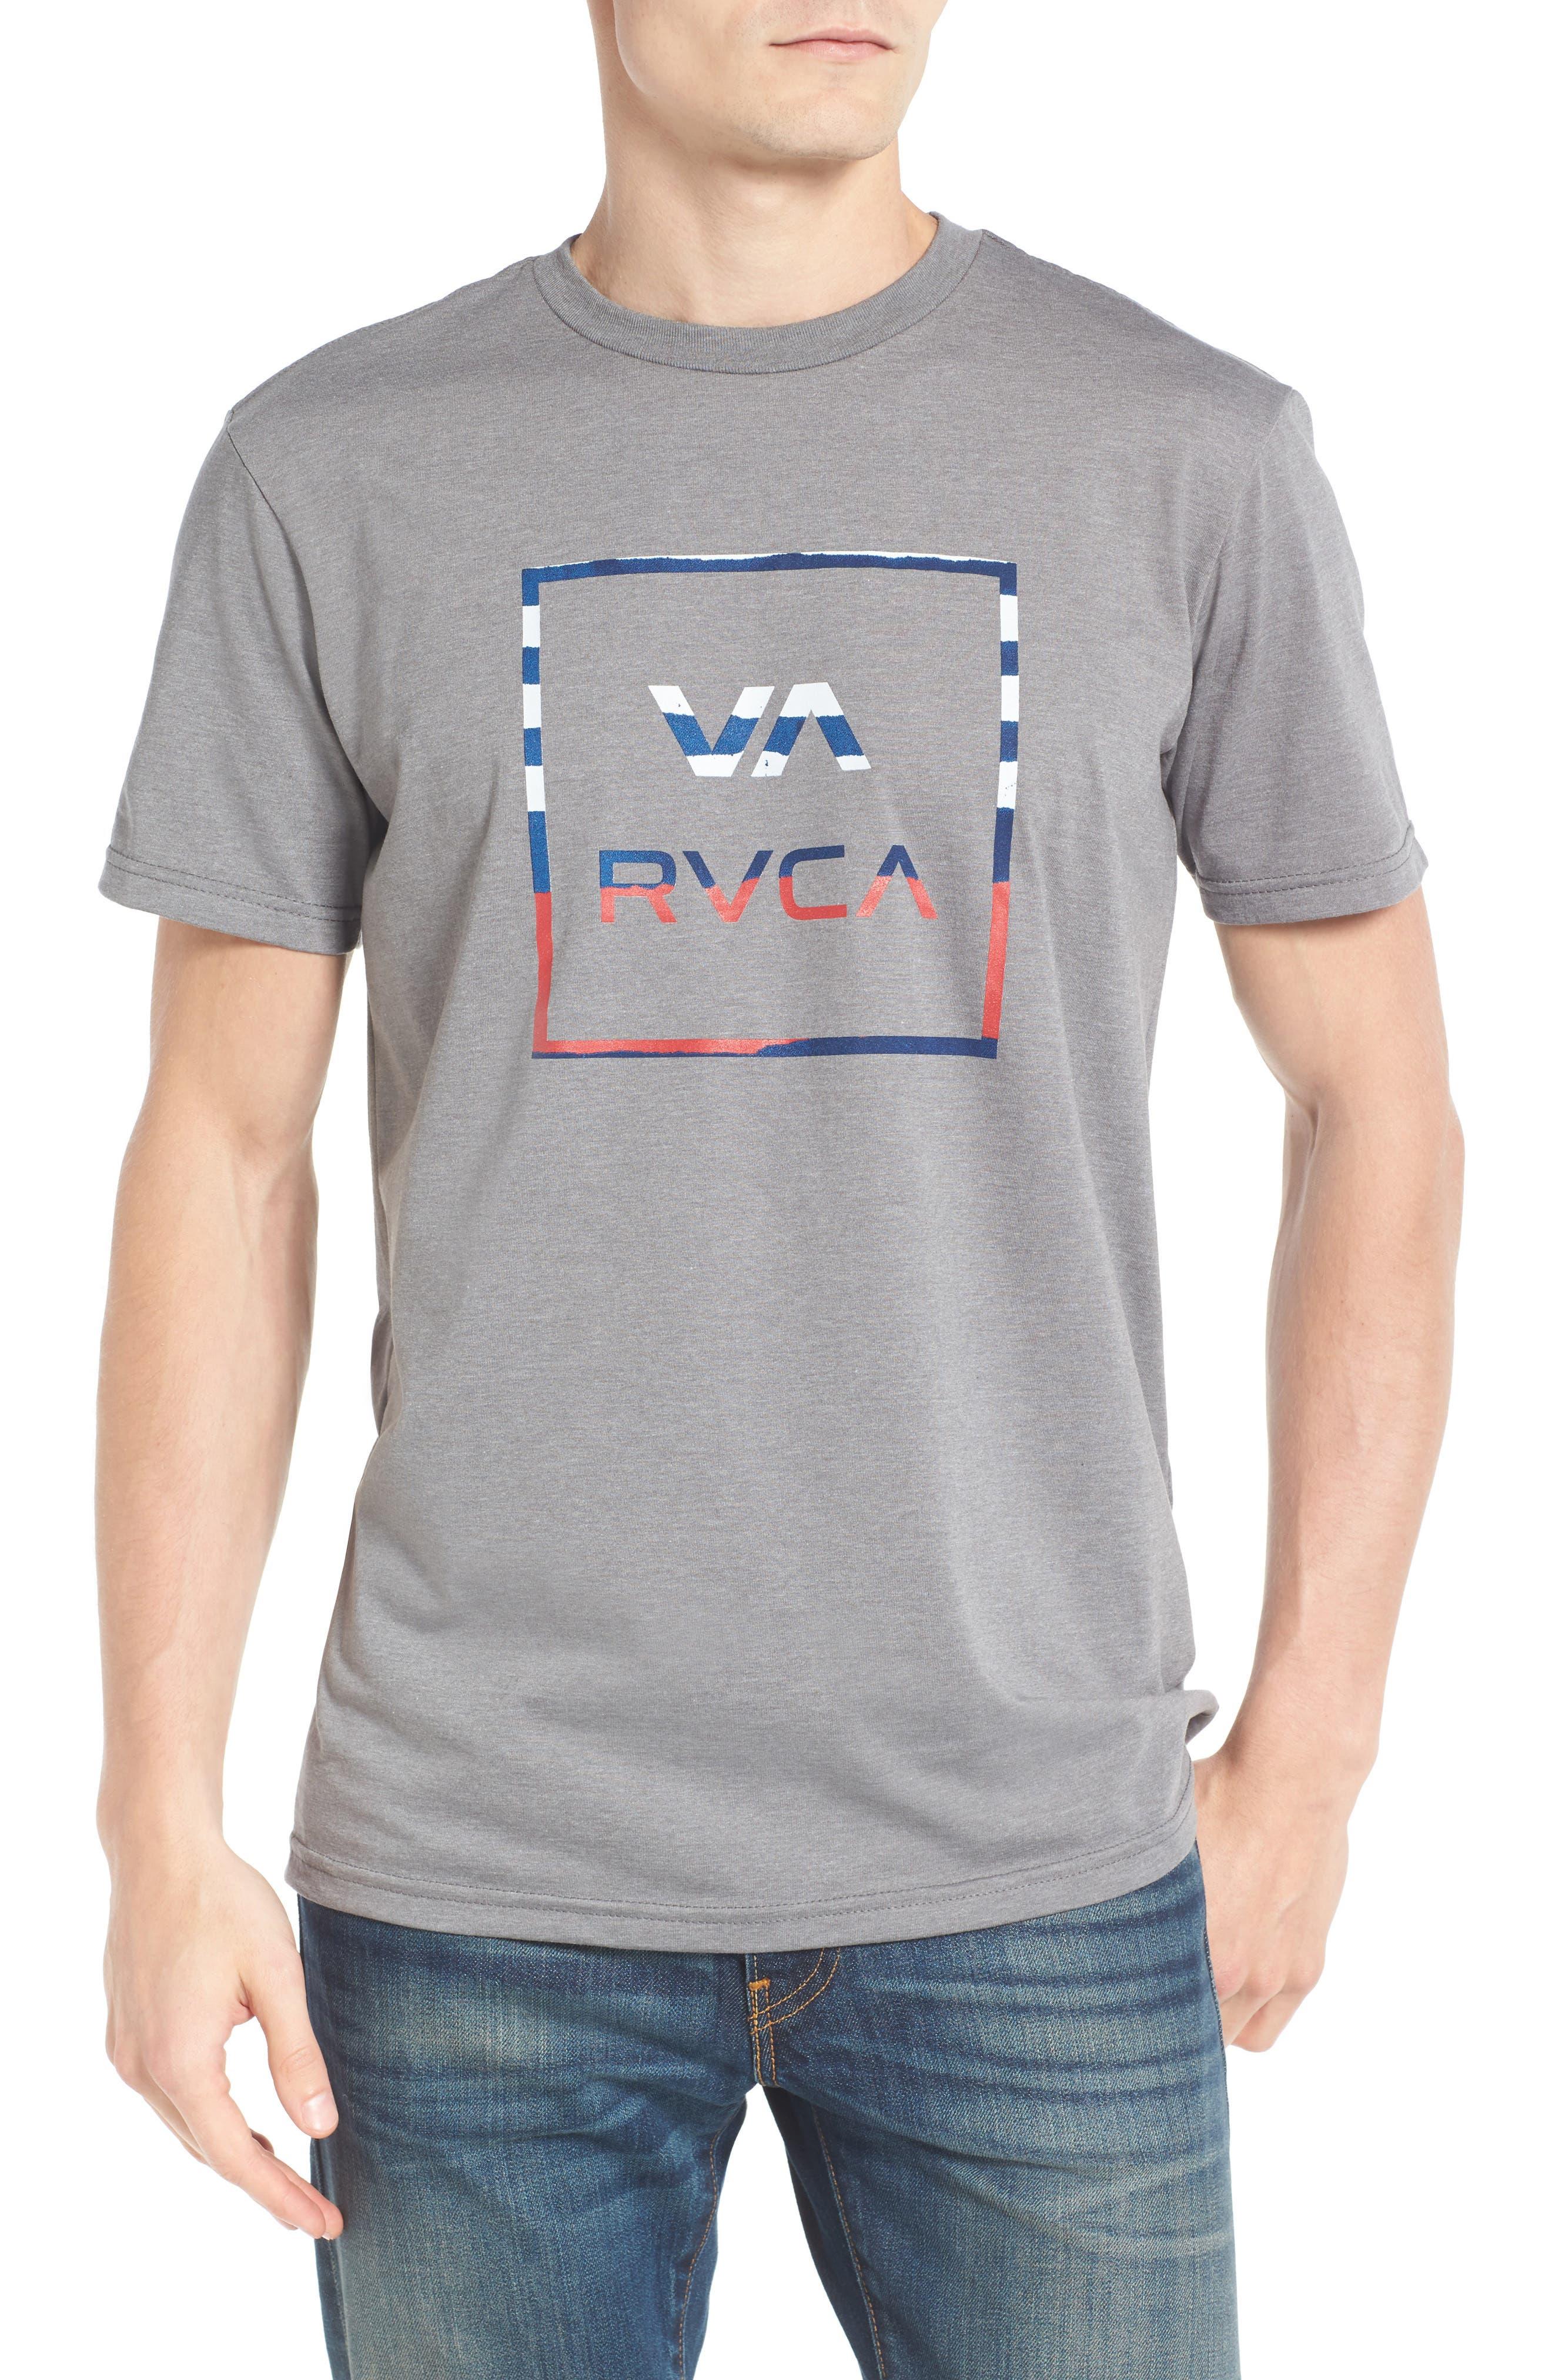 Main Image - RVCA VA All The Way Graphic T-Shirt